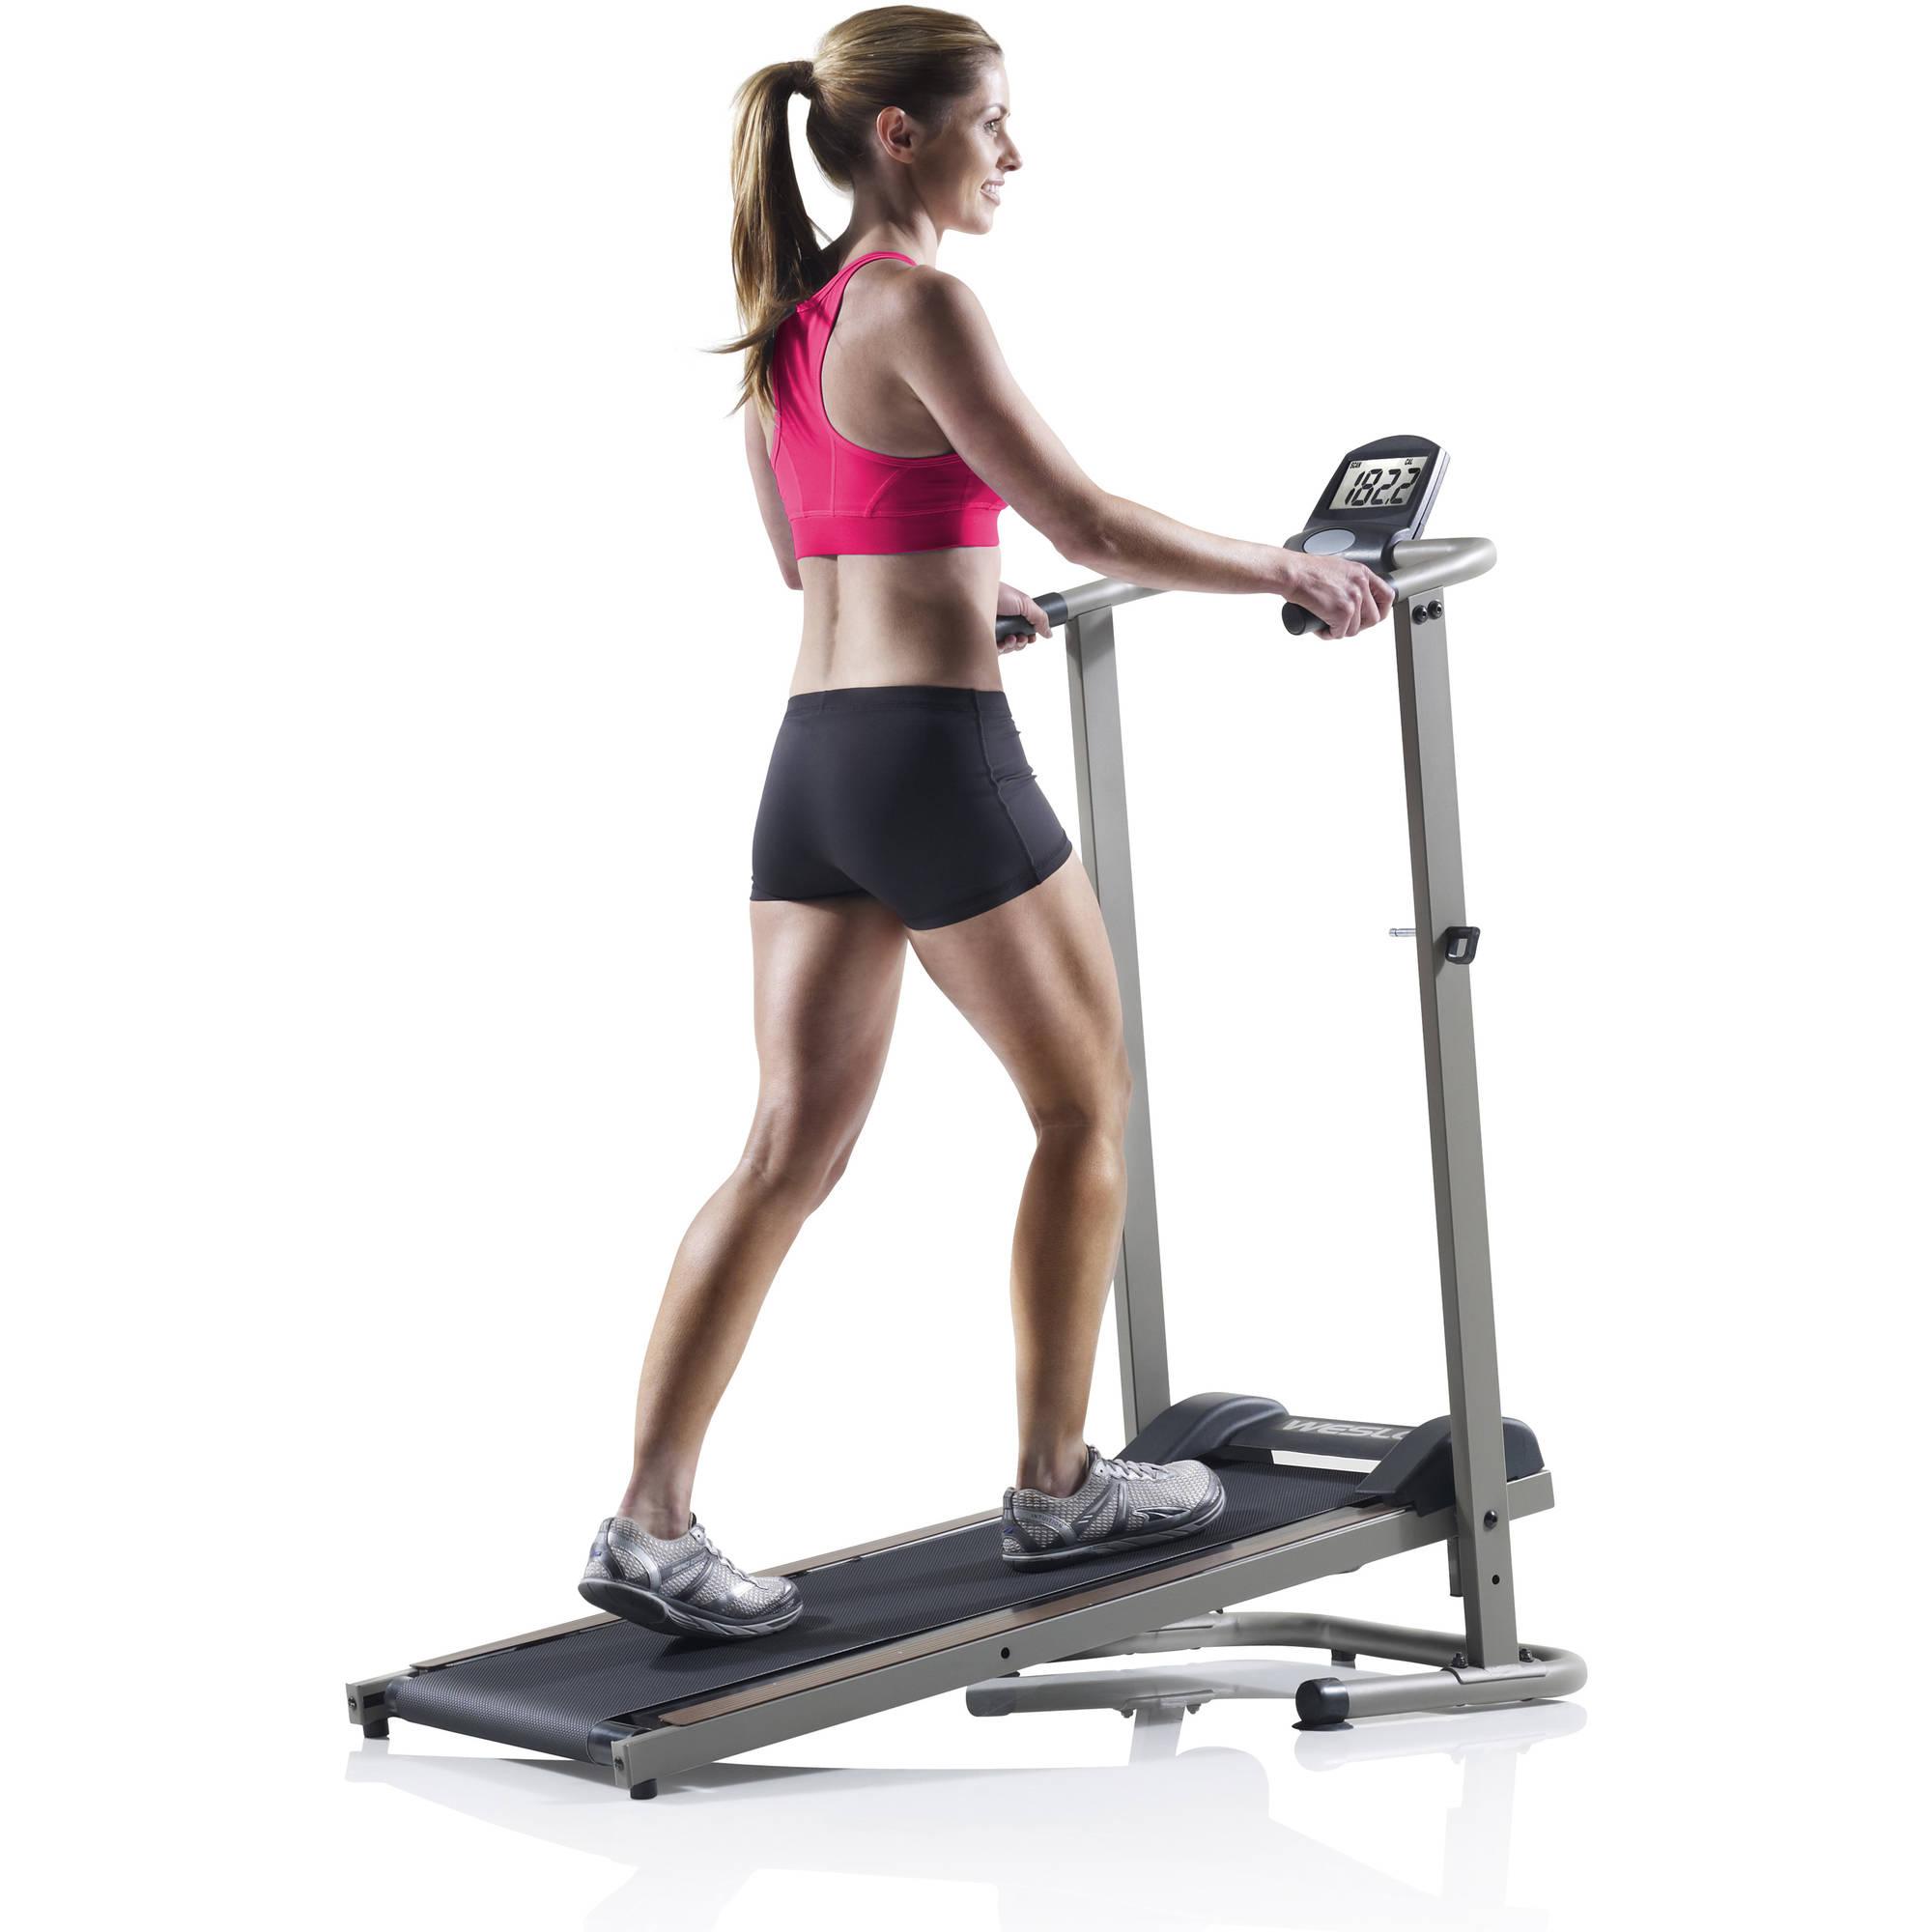 Weslo CardioStride 3.0 Manual Treadmill with Spacesaver Design